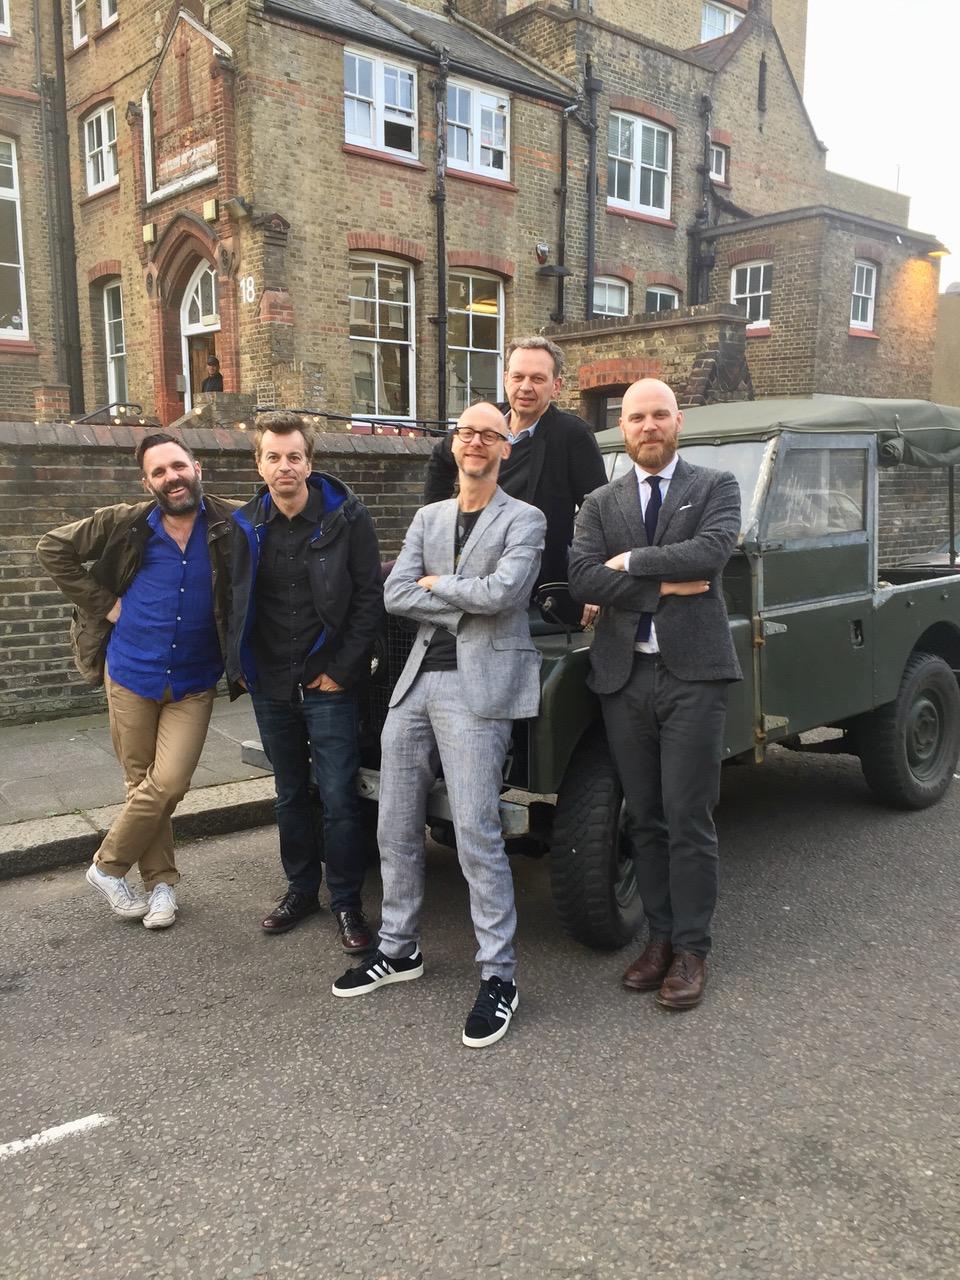 RSF All Star Band: Shaun Keavney, Tim Bran, Martin Terefe, Tom Dixon and Will Champion